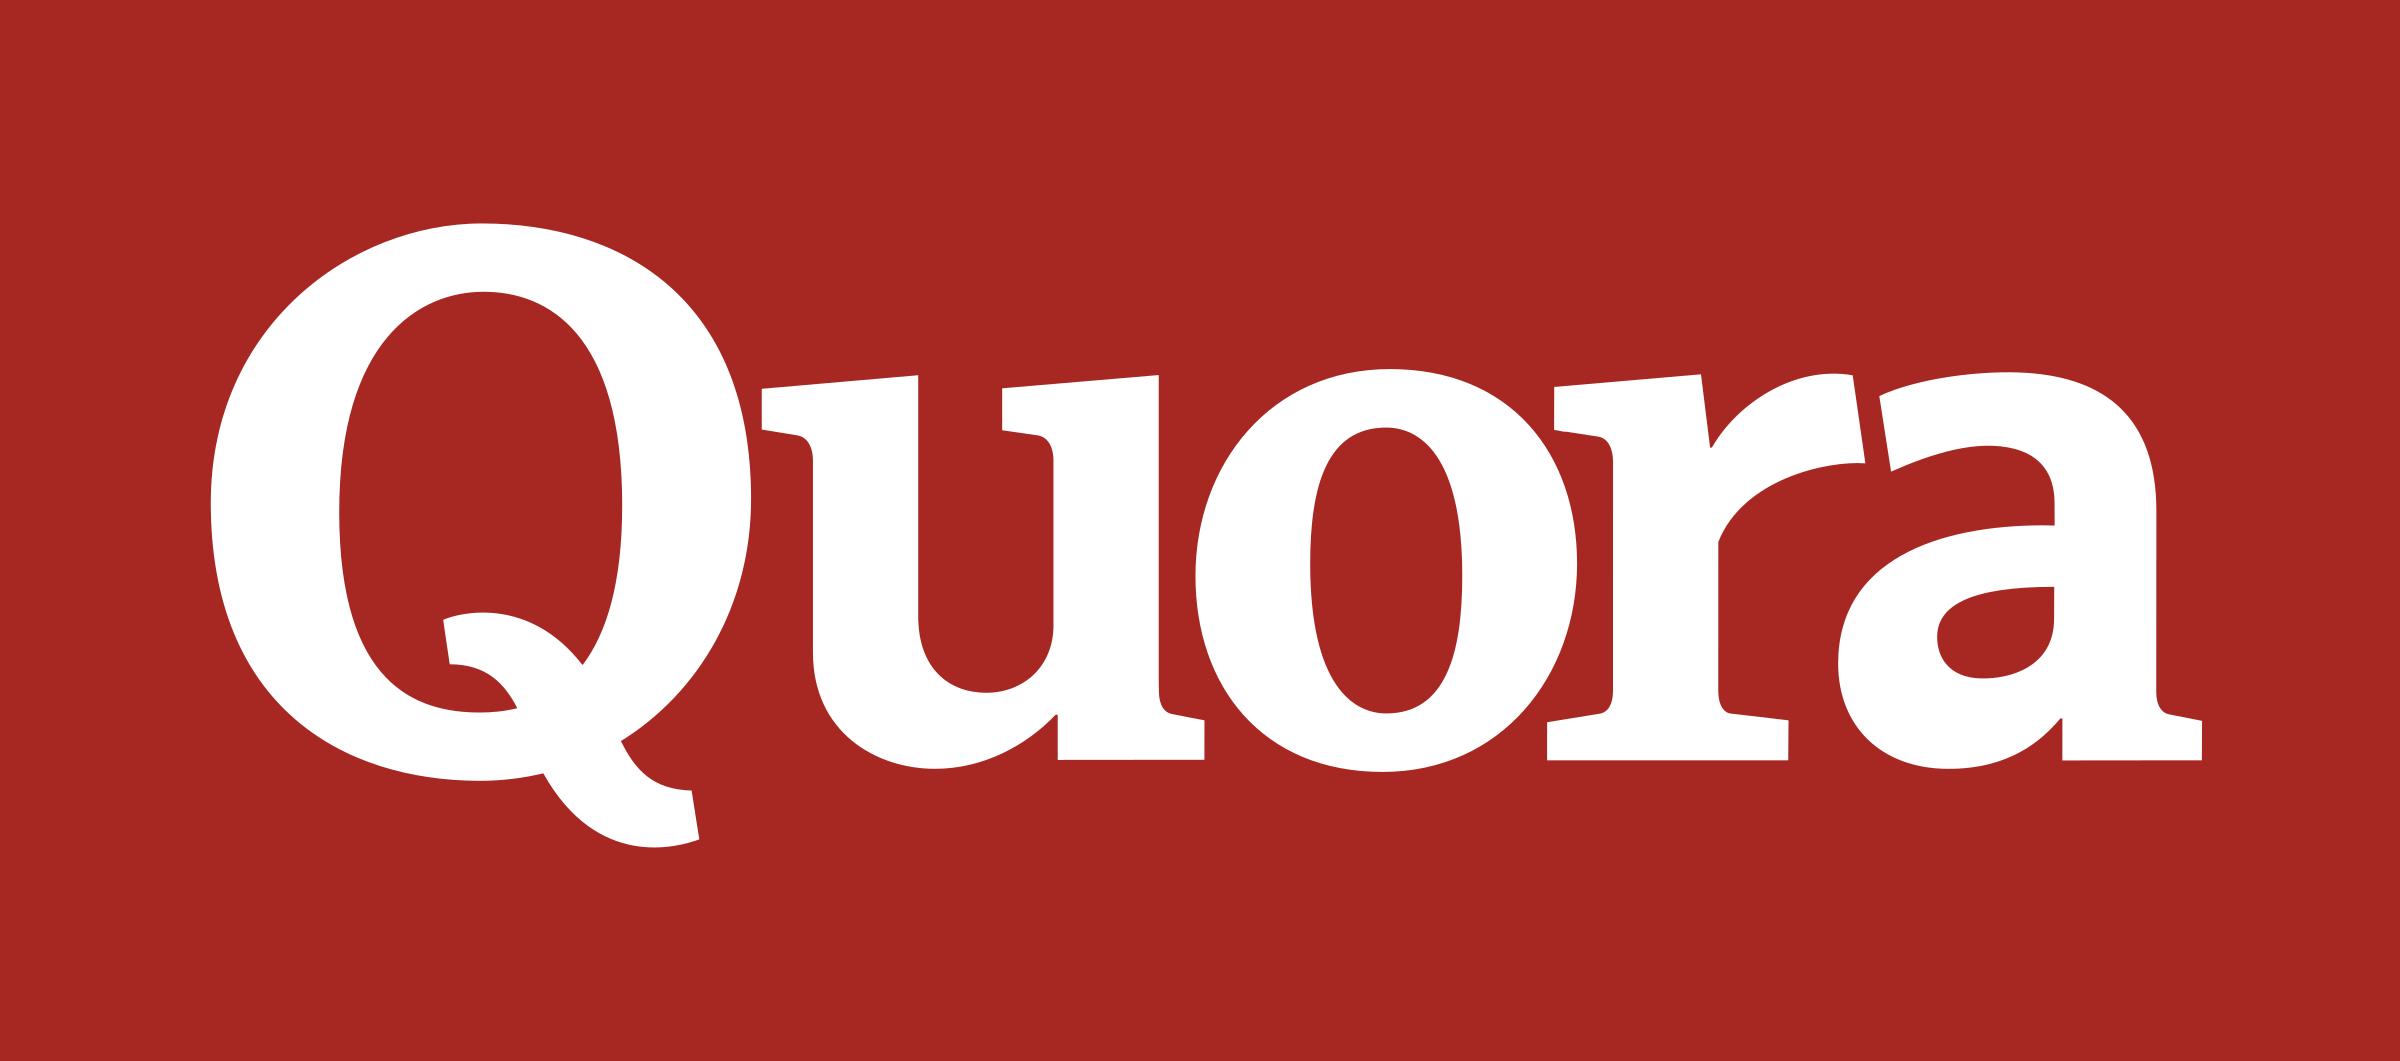 Quora Logo PNG Transparent & SVG Vector - Freebie Supply